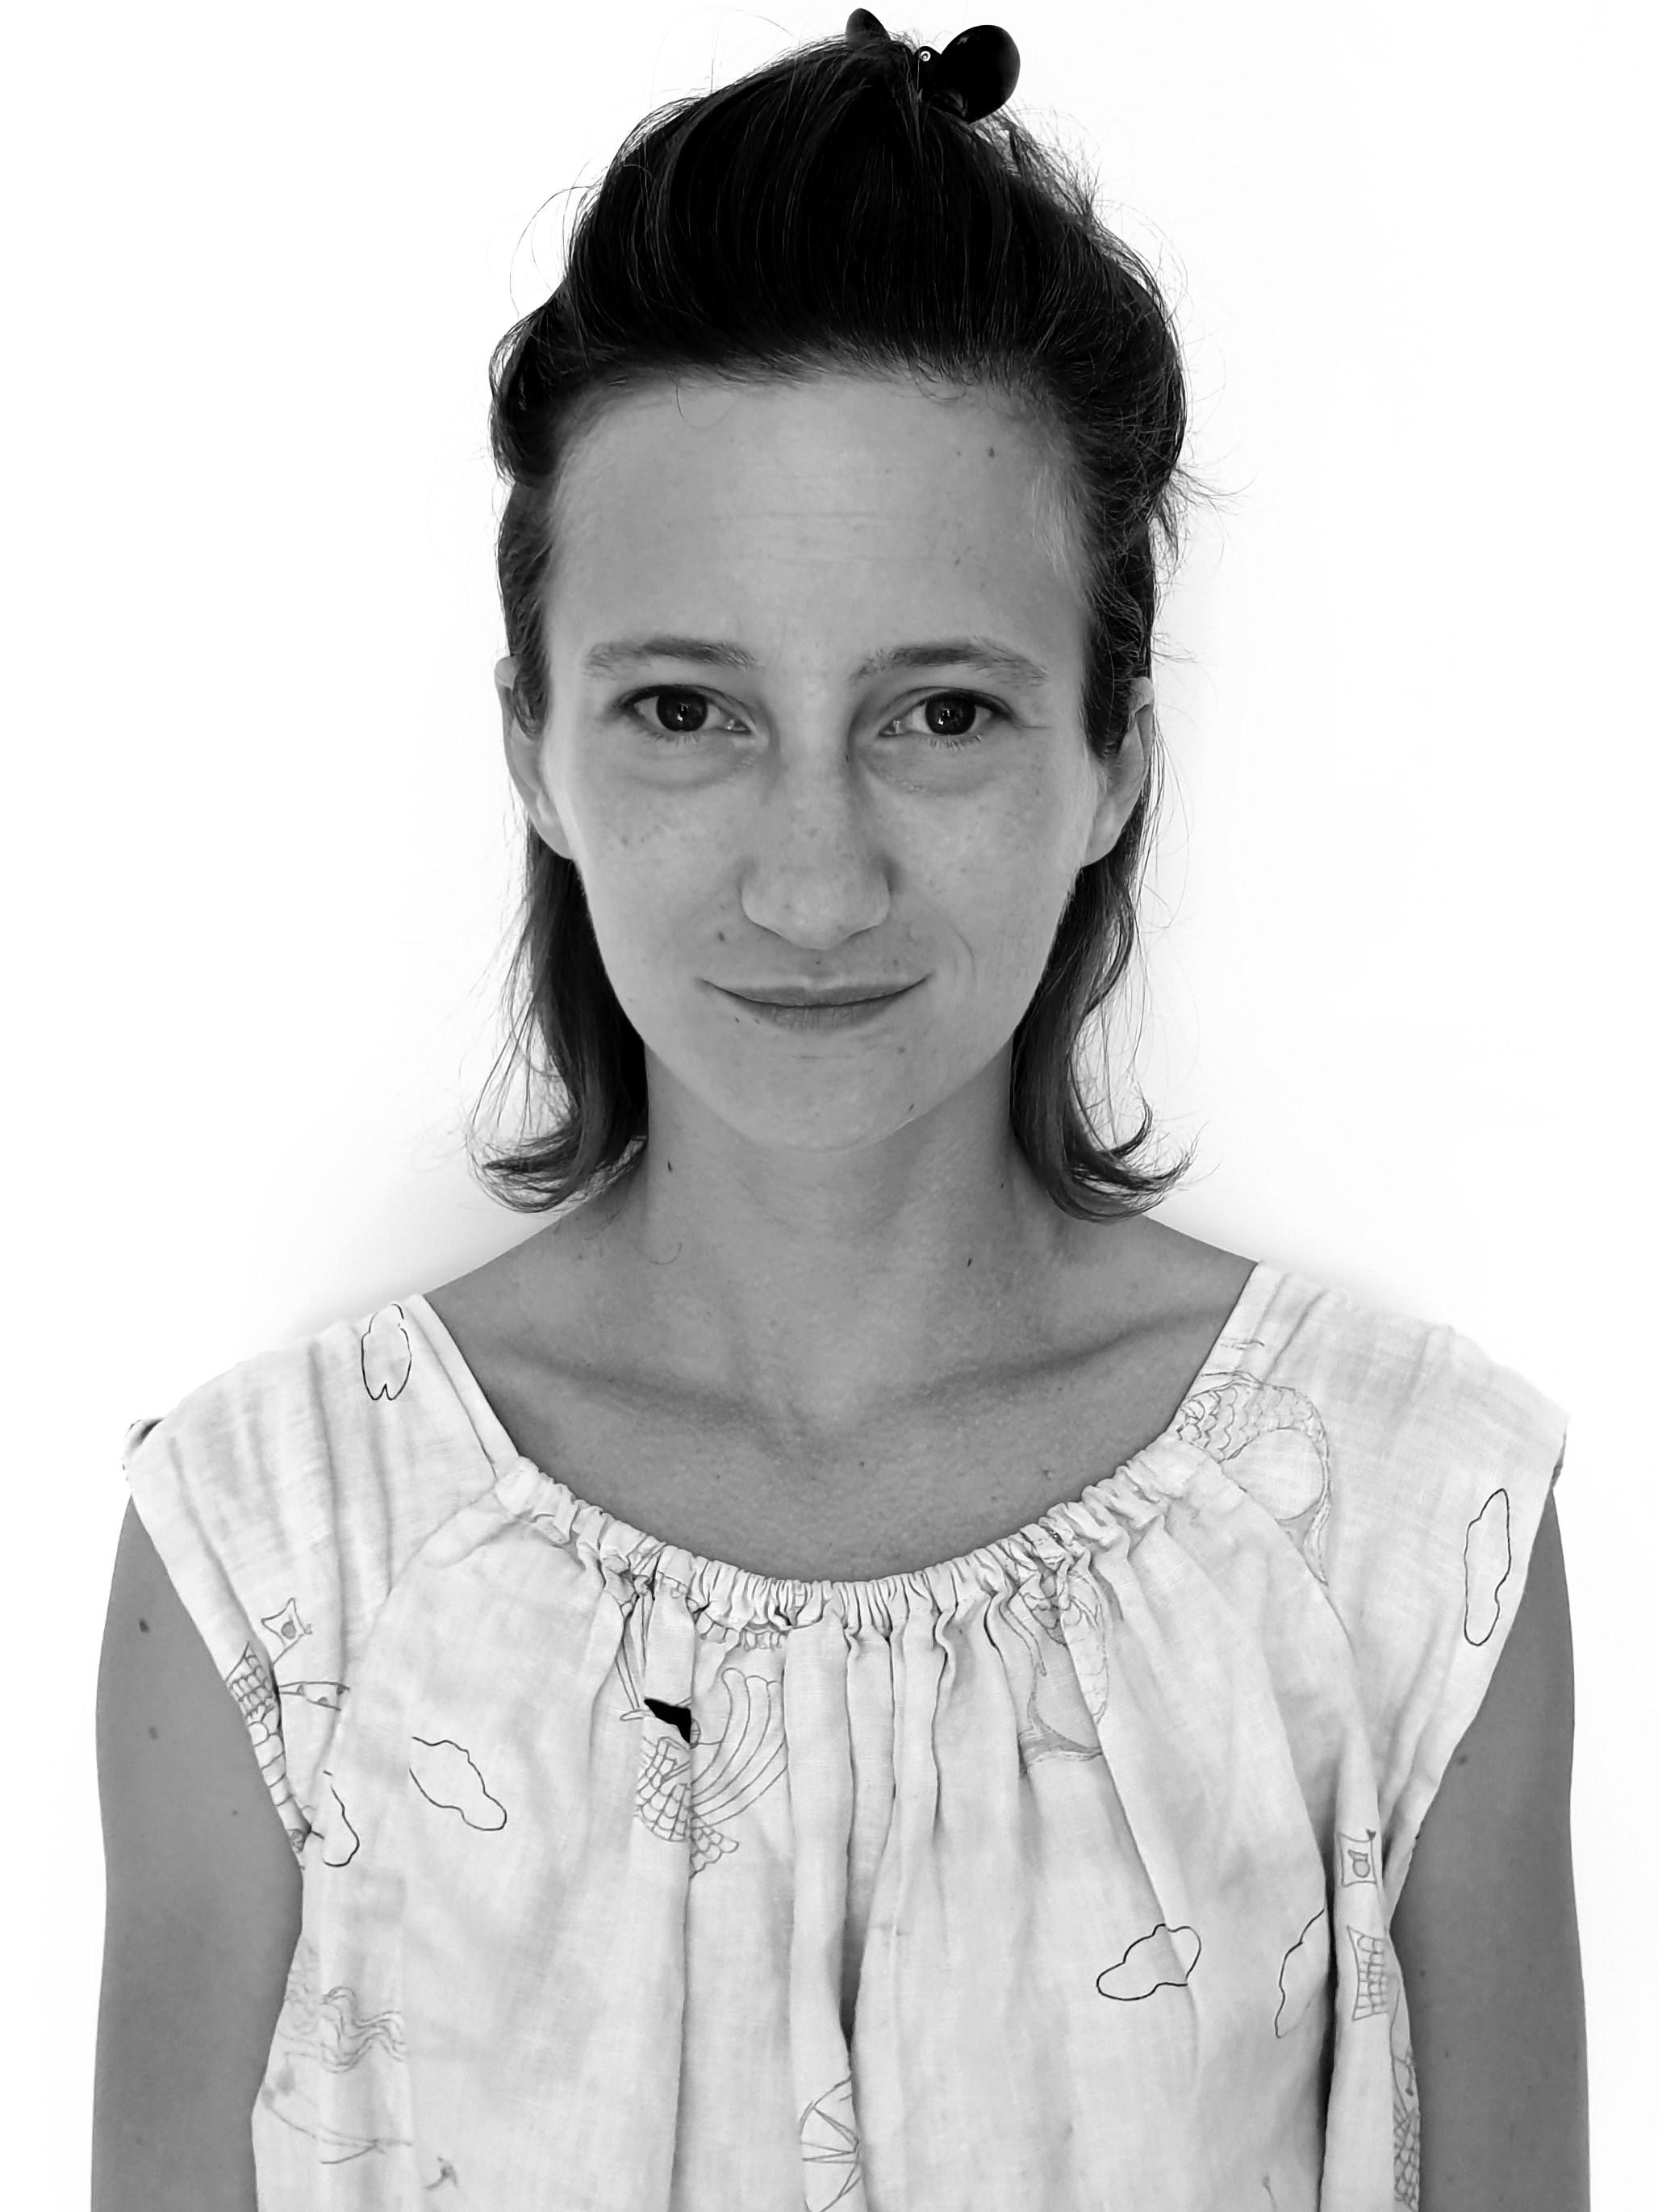 Victoire Thevenin